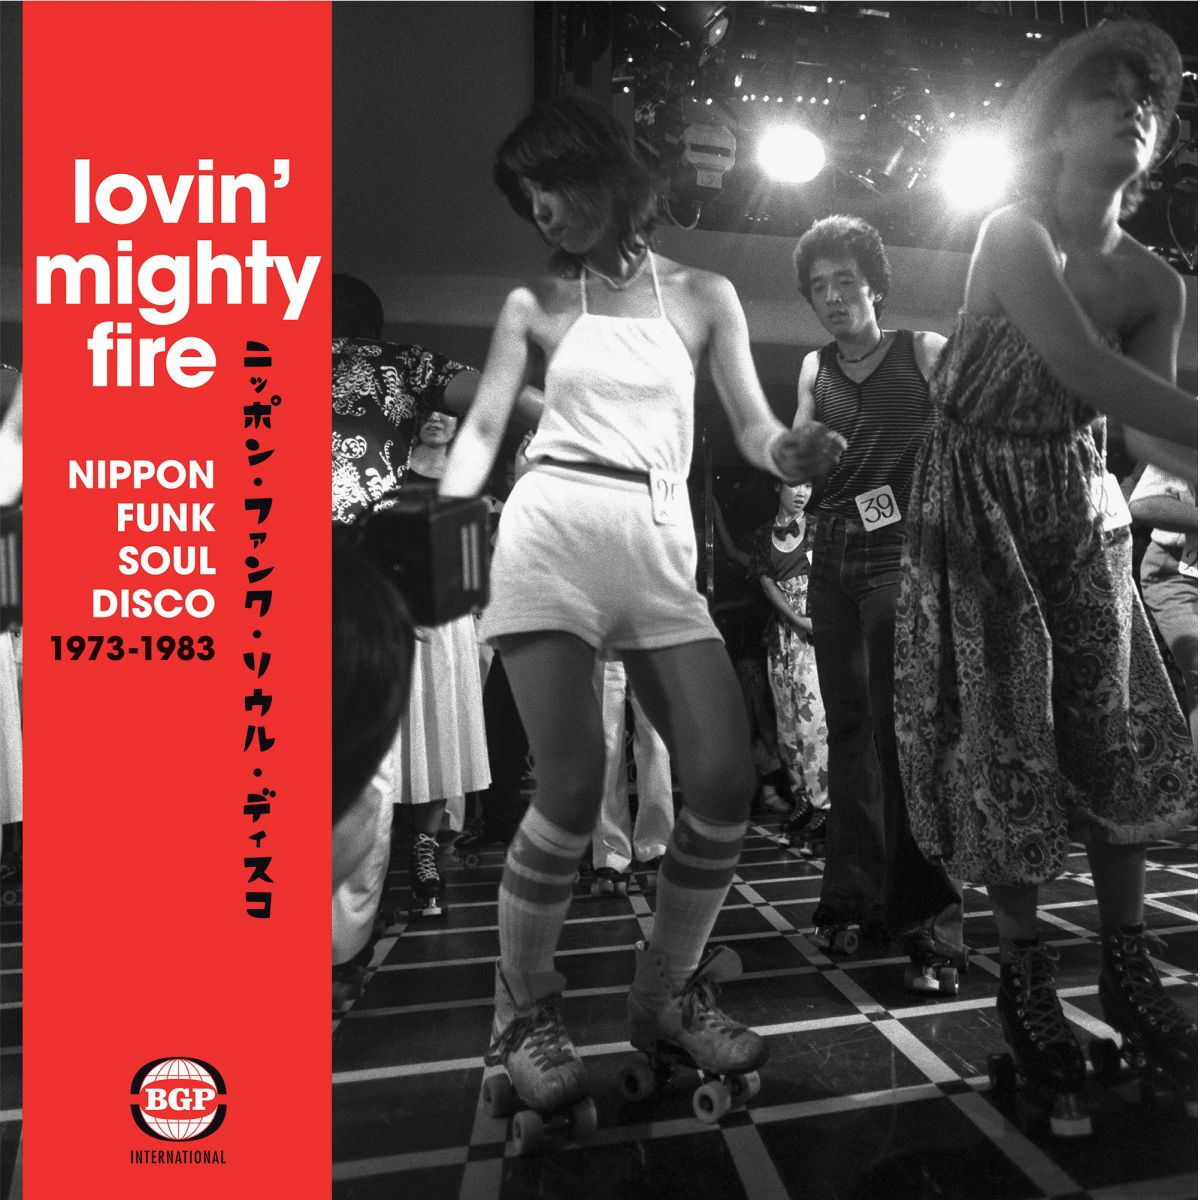 Lovin' Mighty Fire (Nippon Funk • Soul • Disco 1973-1983)